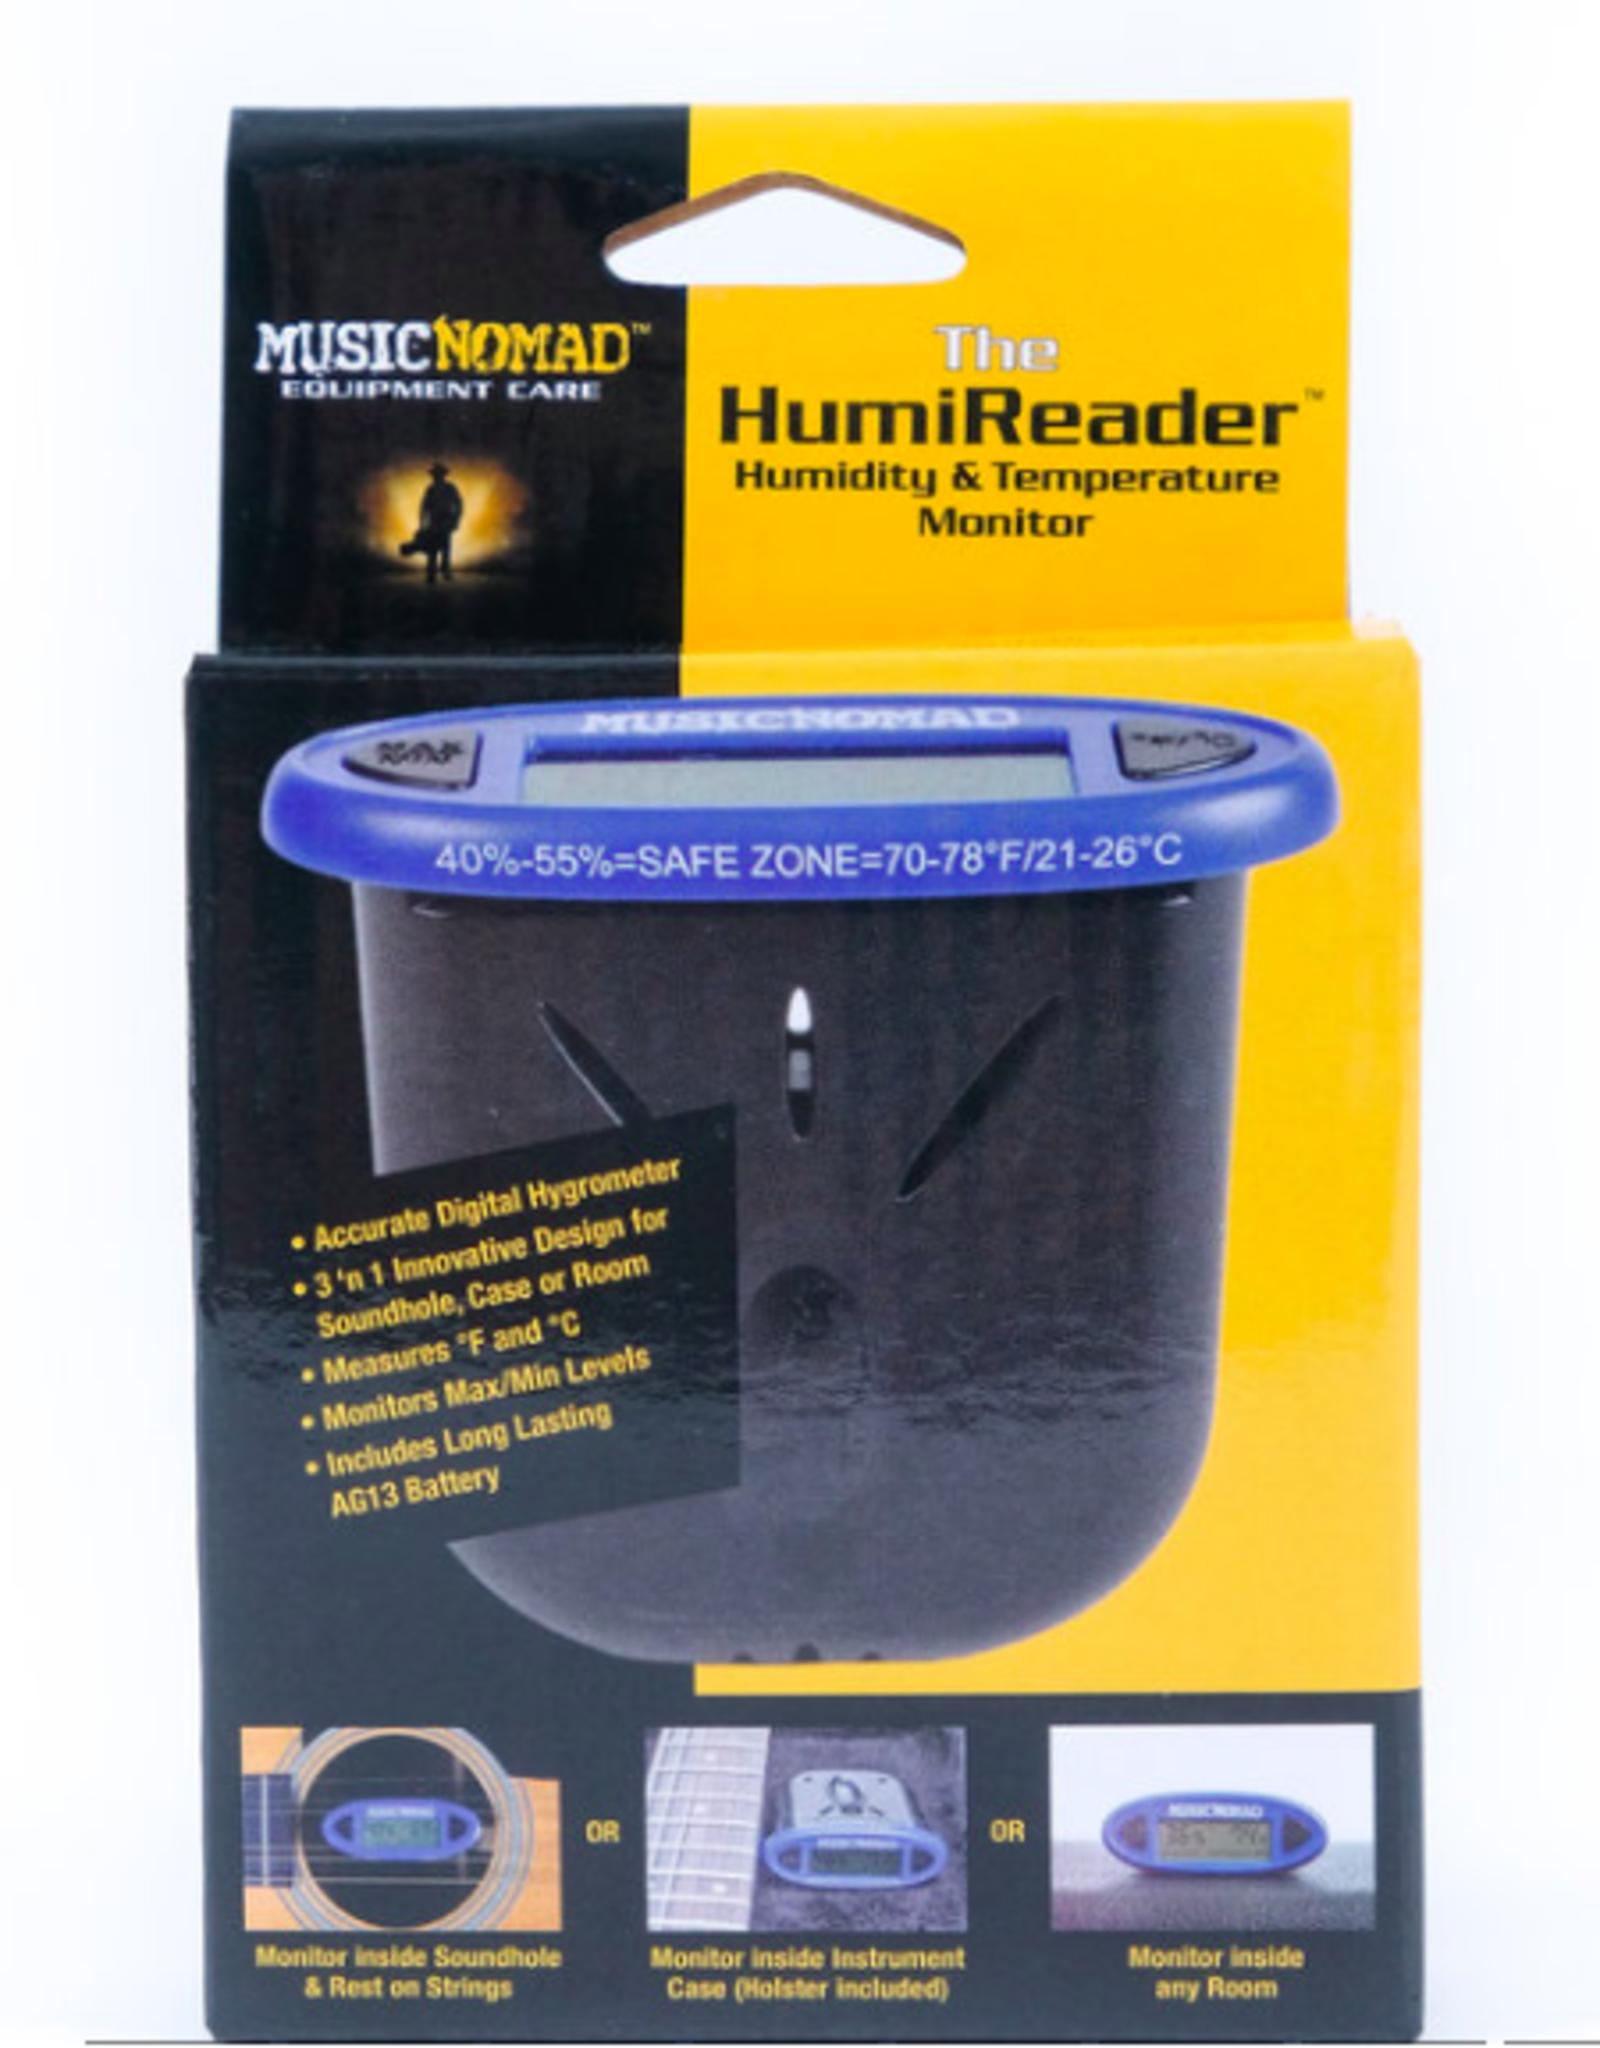 MUSIC NOMAD The HumiReader - Humidity & Temperature Monitor